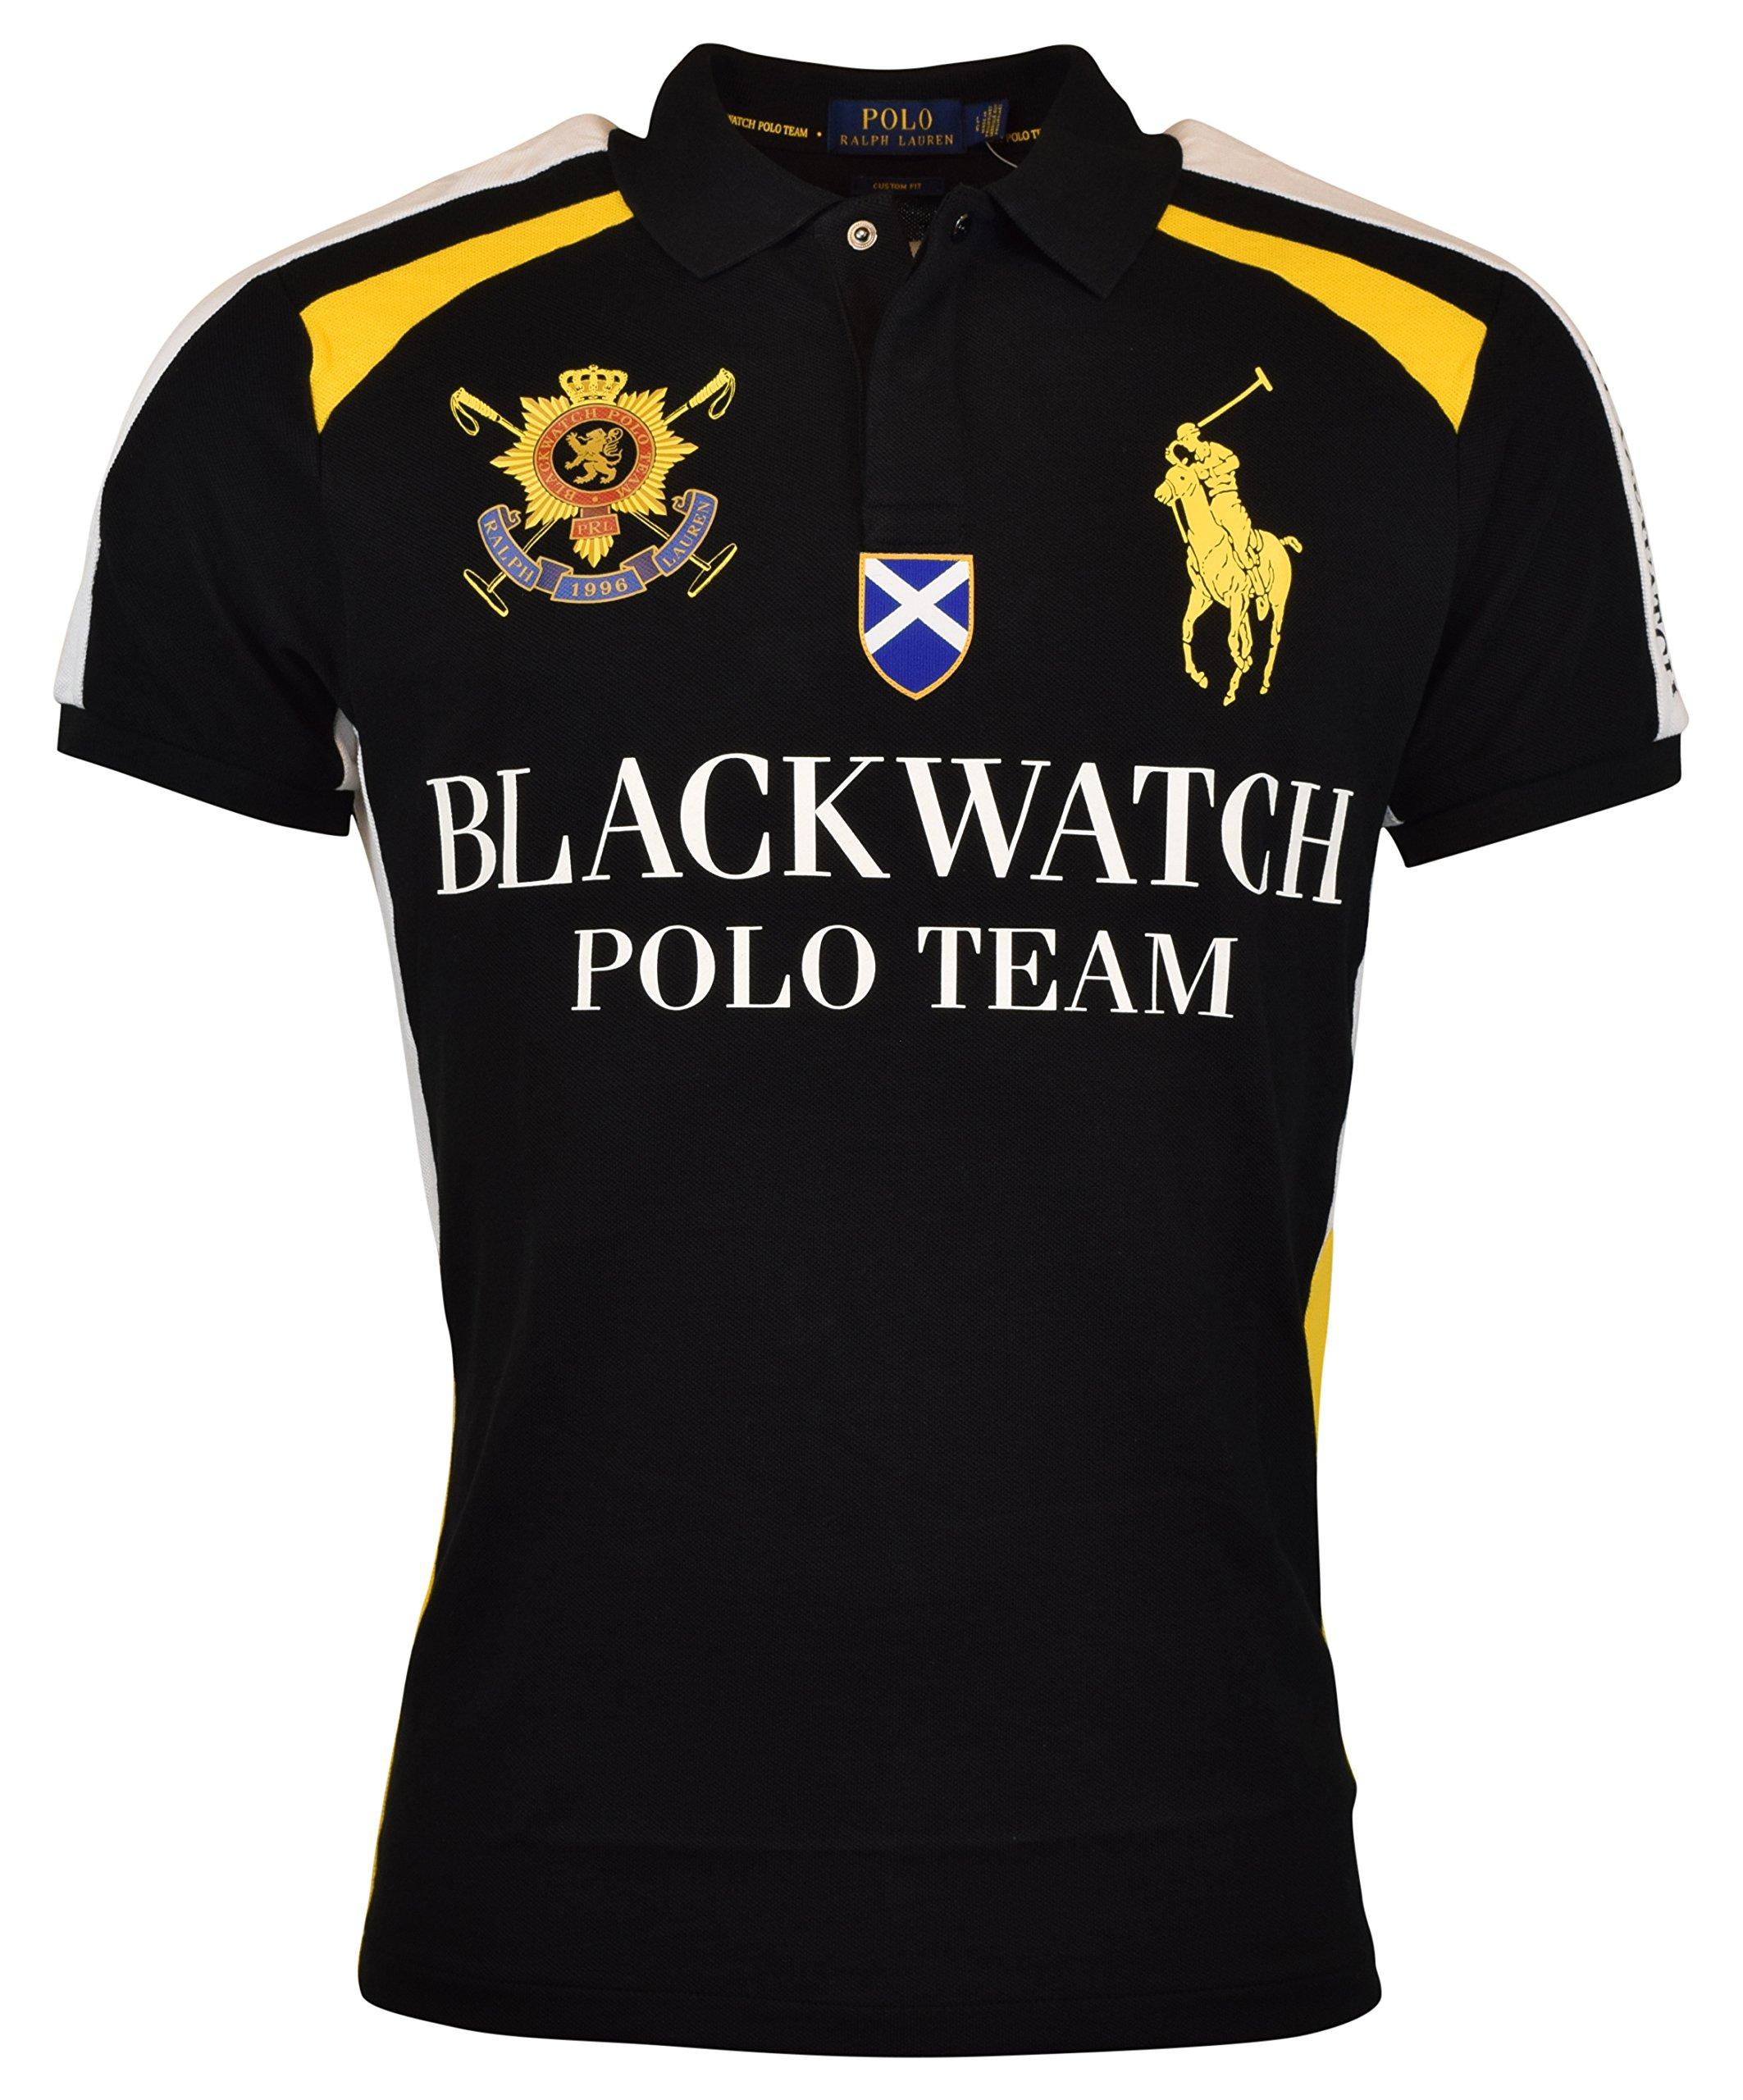 Polo Ralph Lauren Mens Custom Fit Blackwatch Polo Shirt - XXL - Polo Black